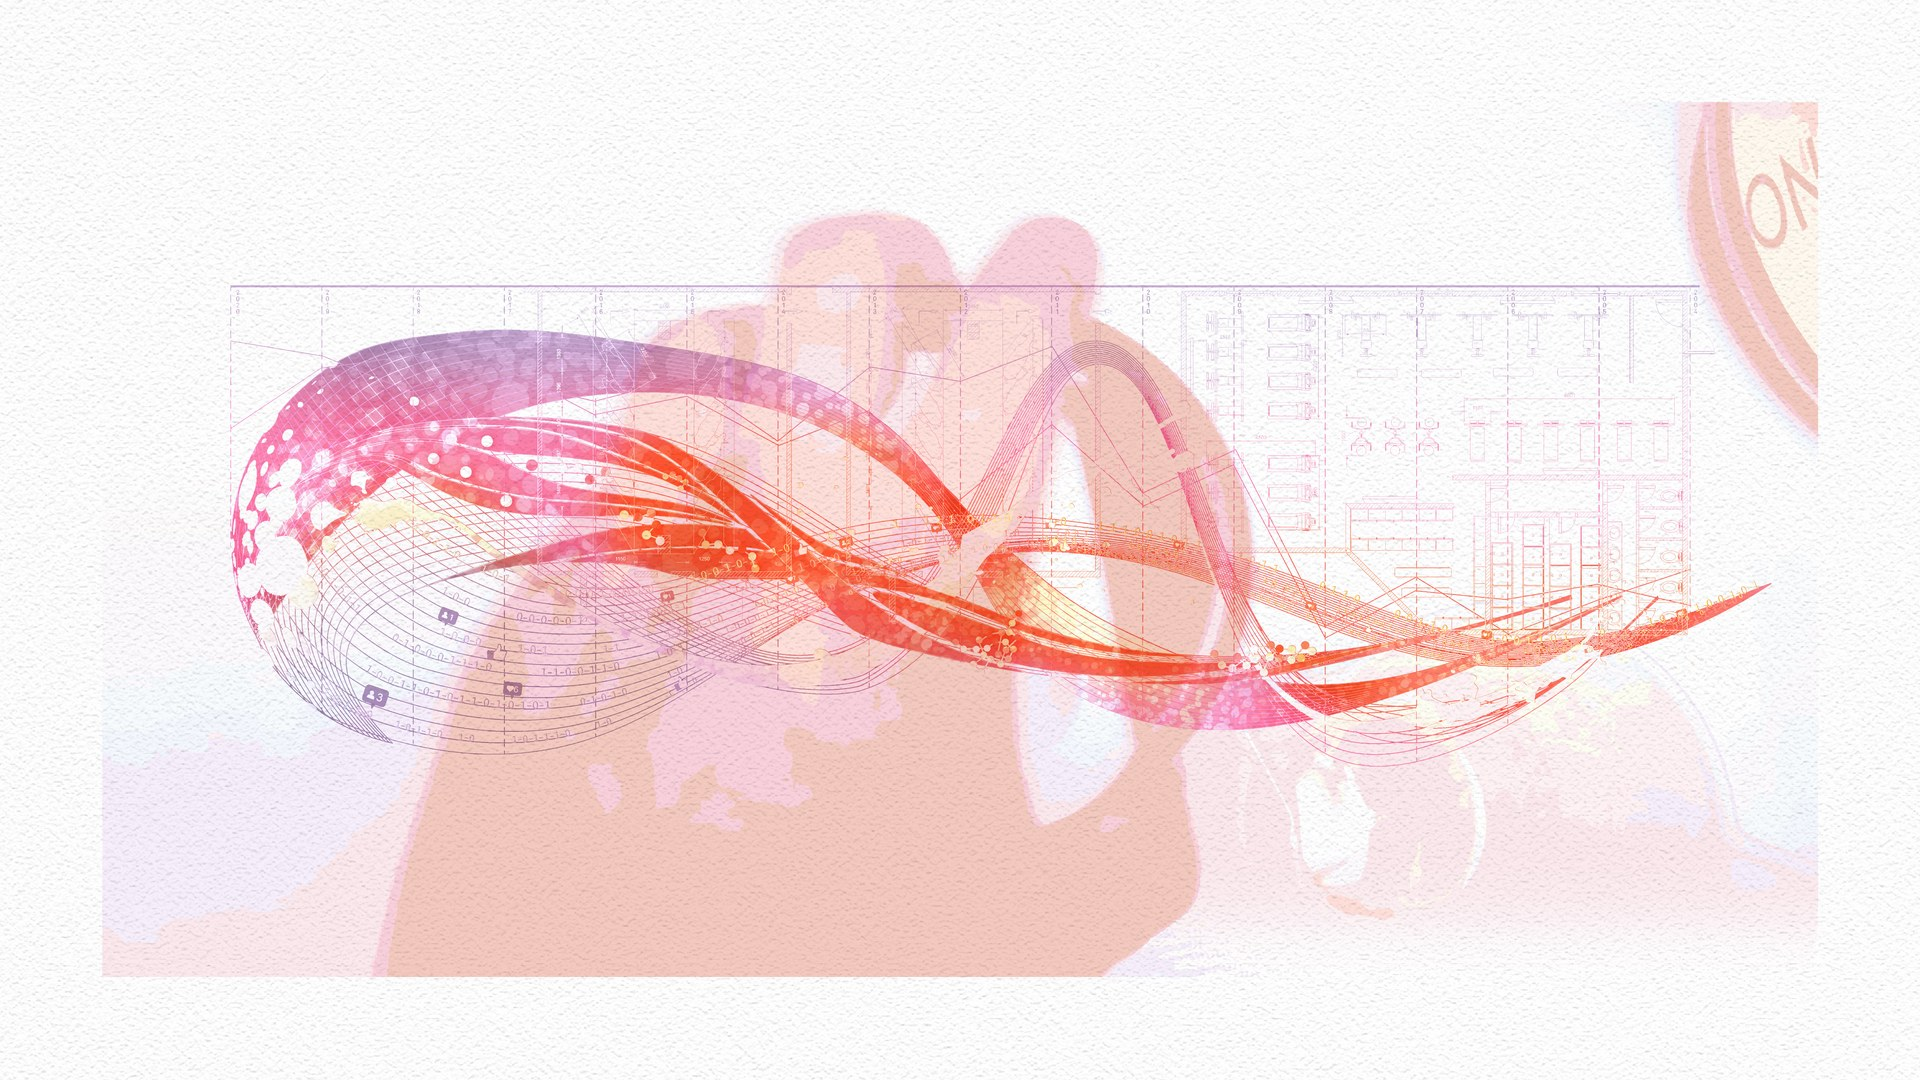 Whey protein - Metabolic pathways